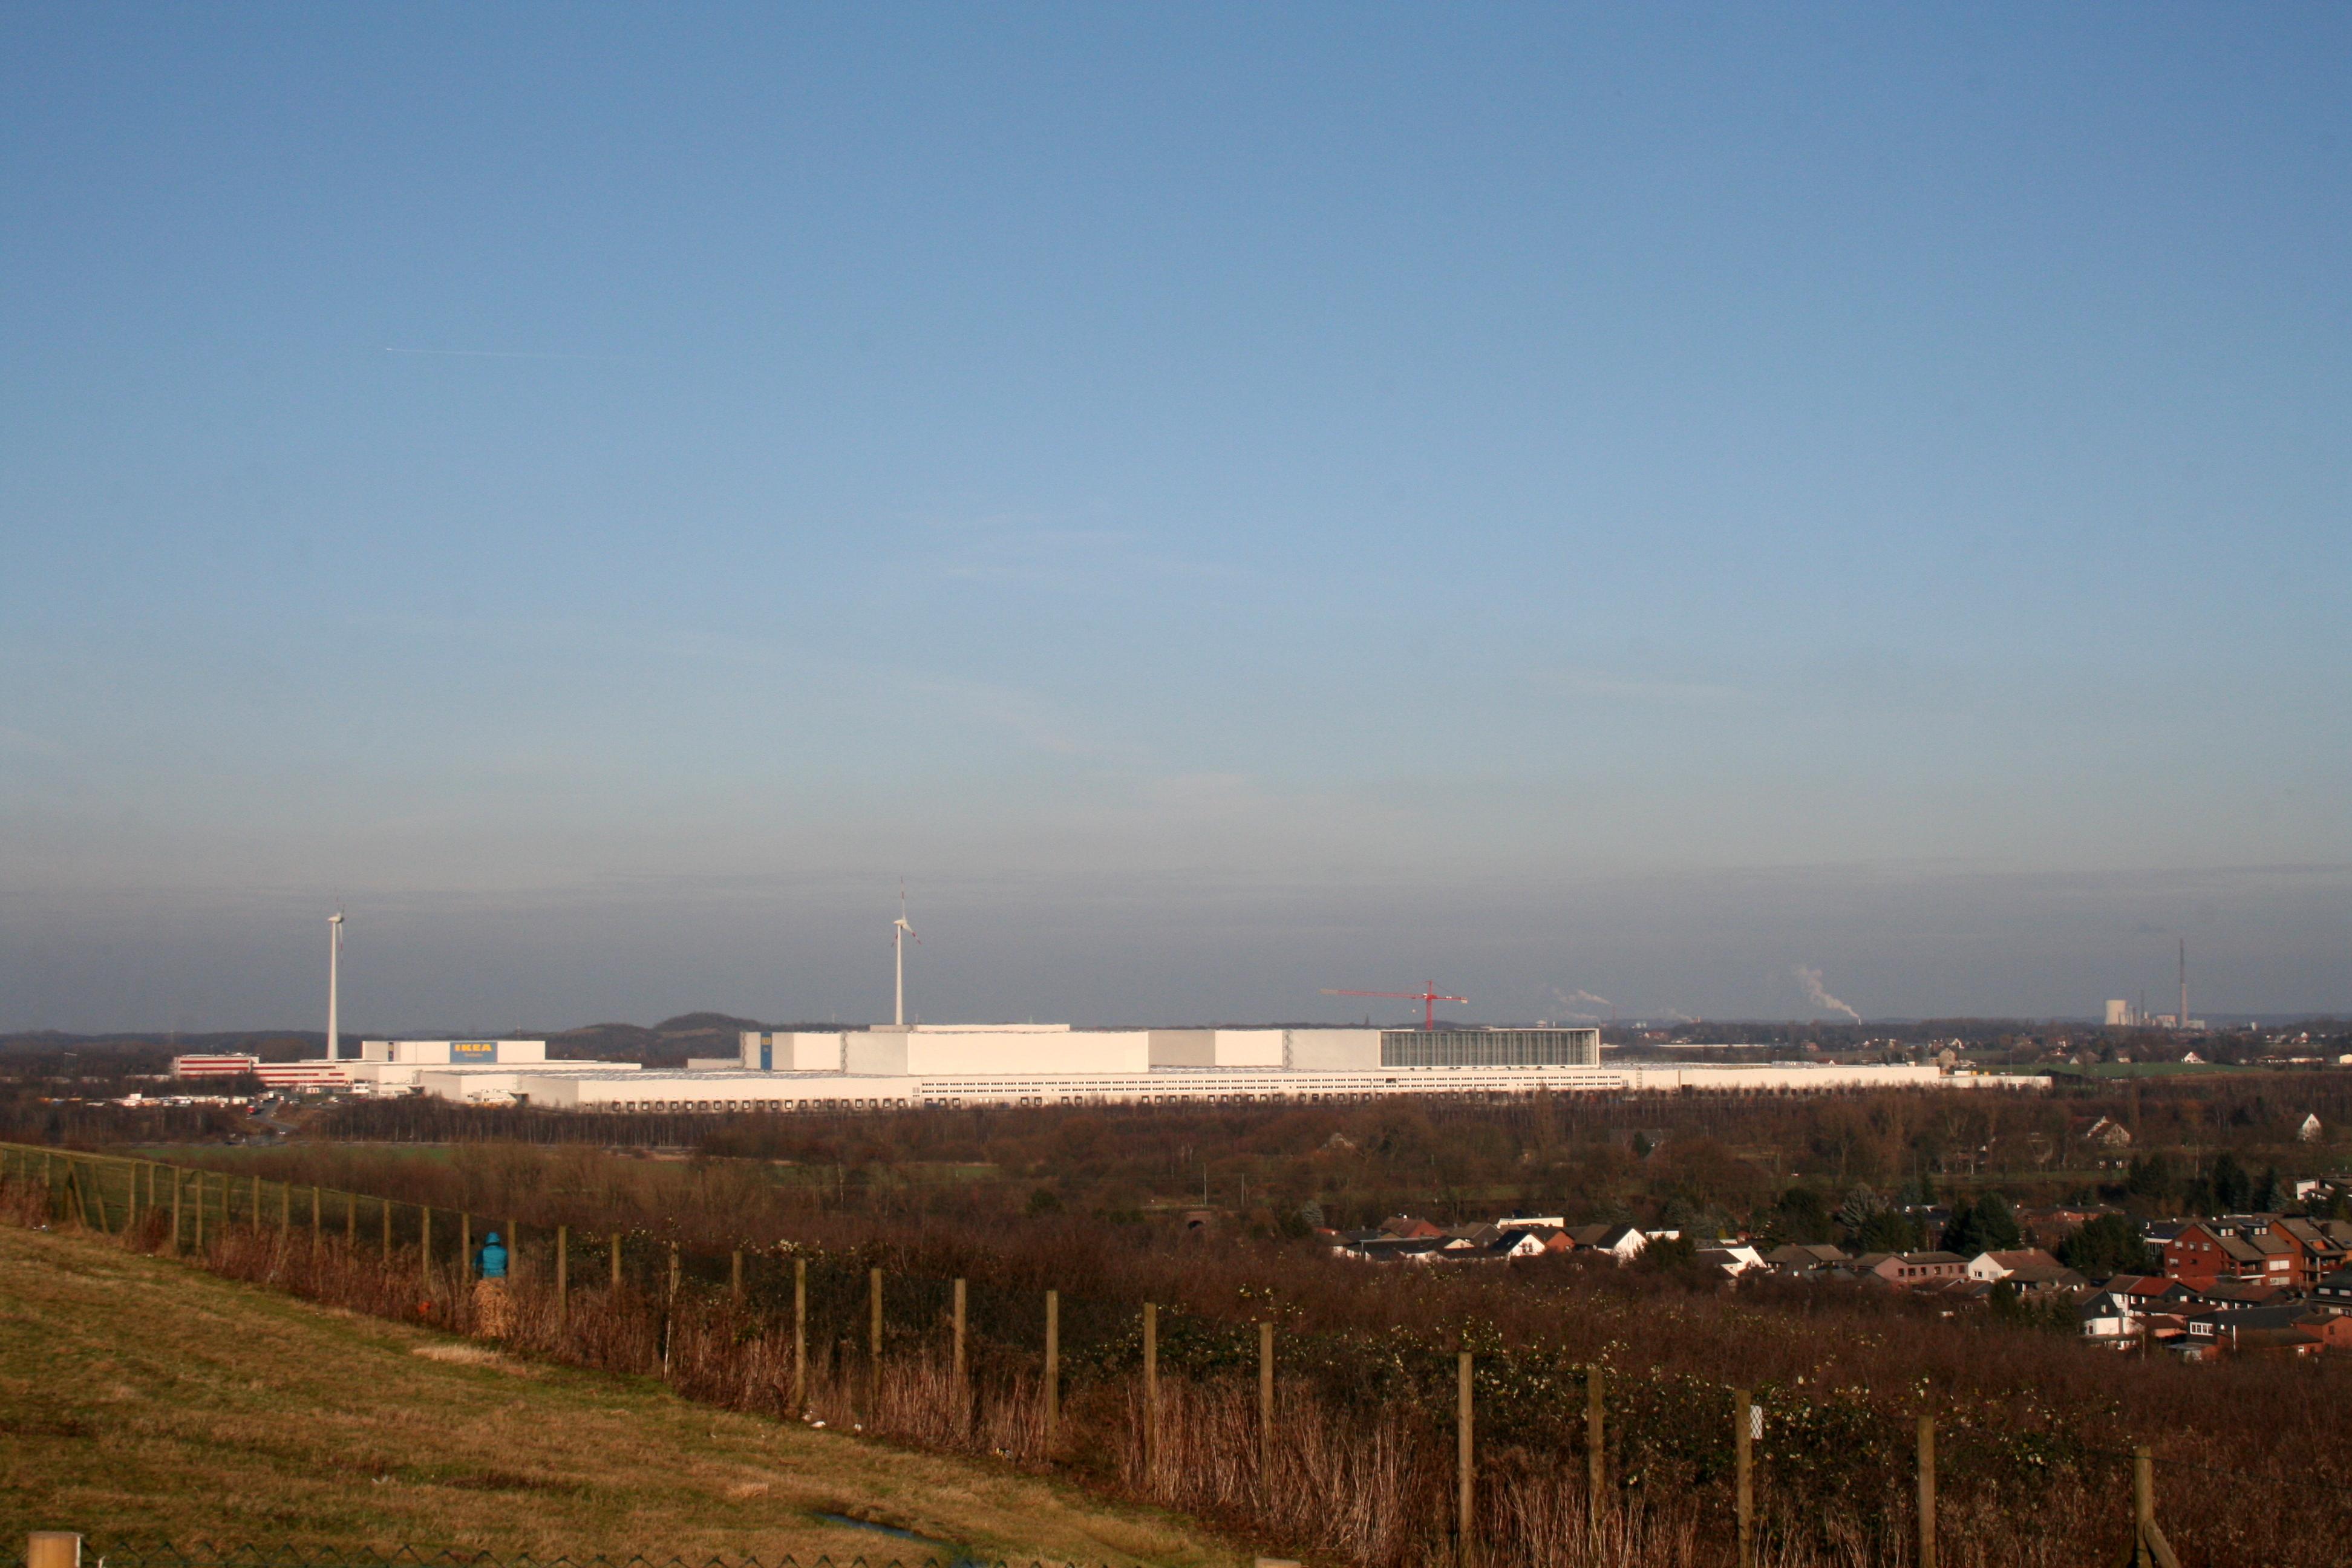 Dateiikea Dortmund Ellinghausenjpg Wikipedia